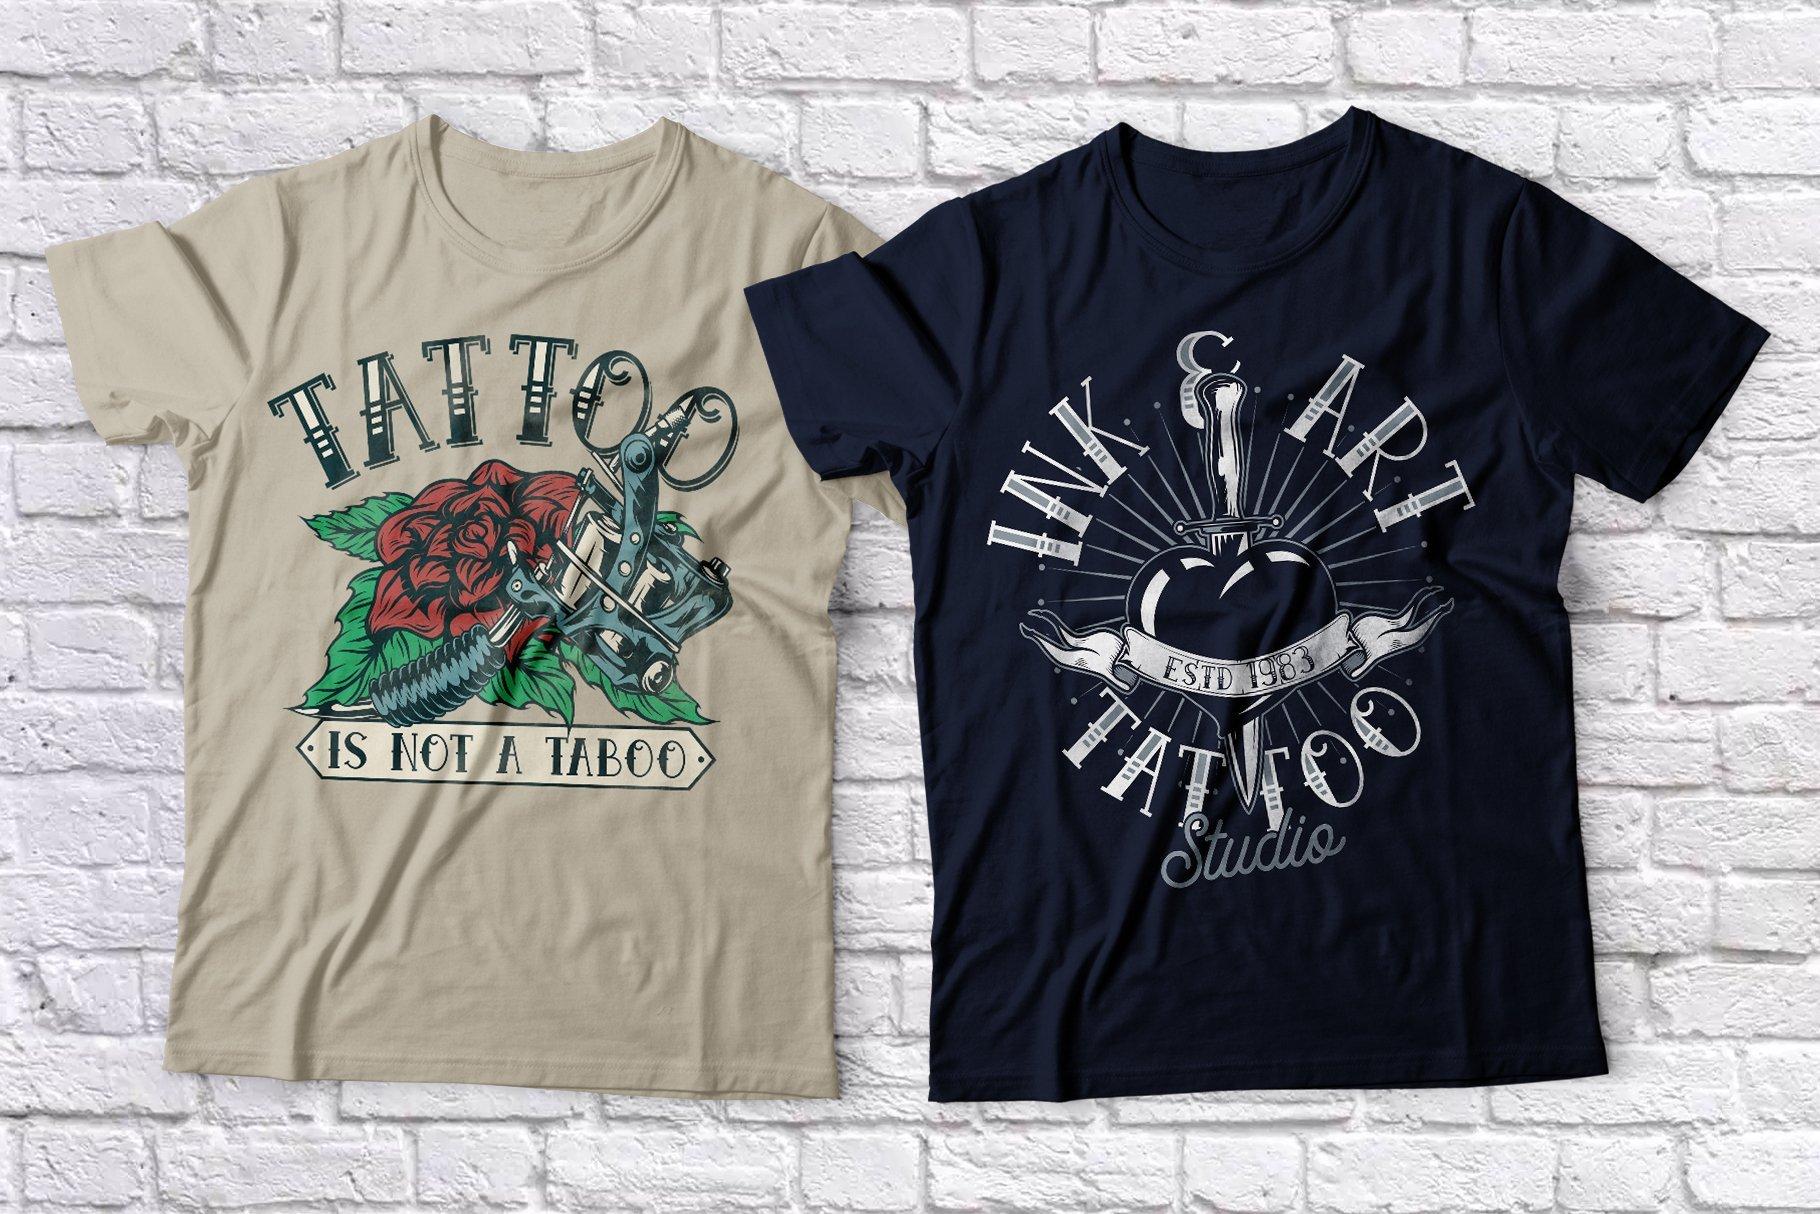 Purely tattooed T-shirts.